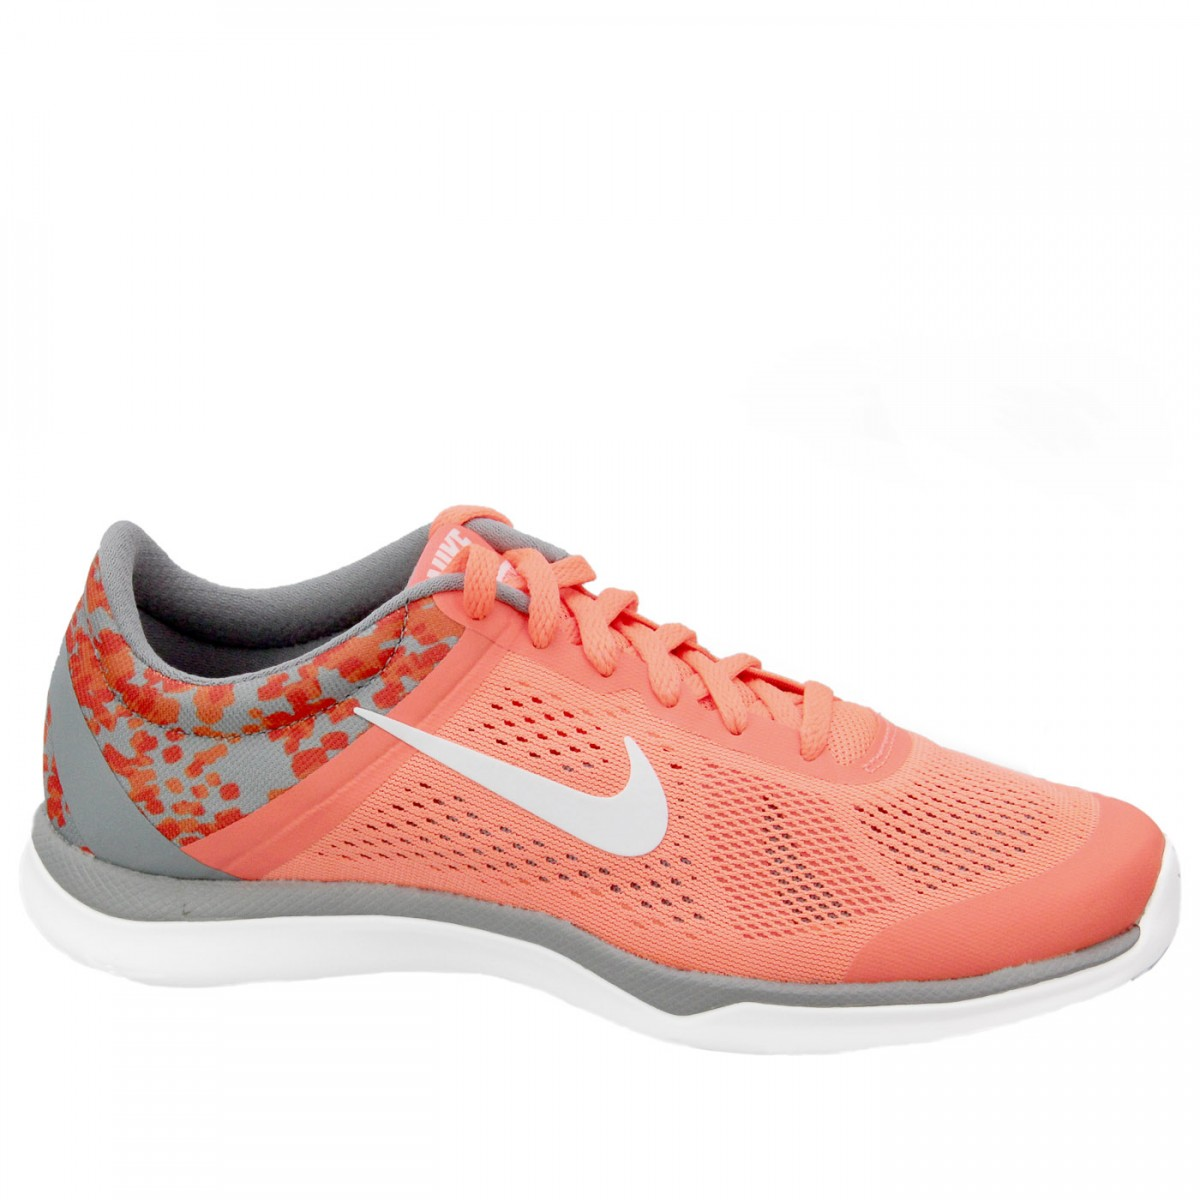 63d7f25165d Bizz Store - Tênis Nike Feminino Esportivo In-Season TR 5 Print